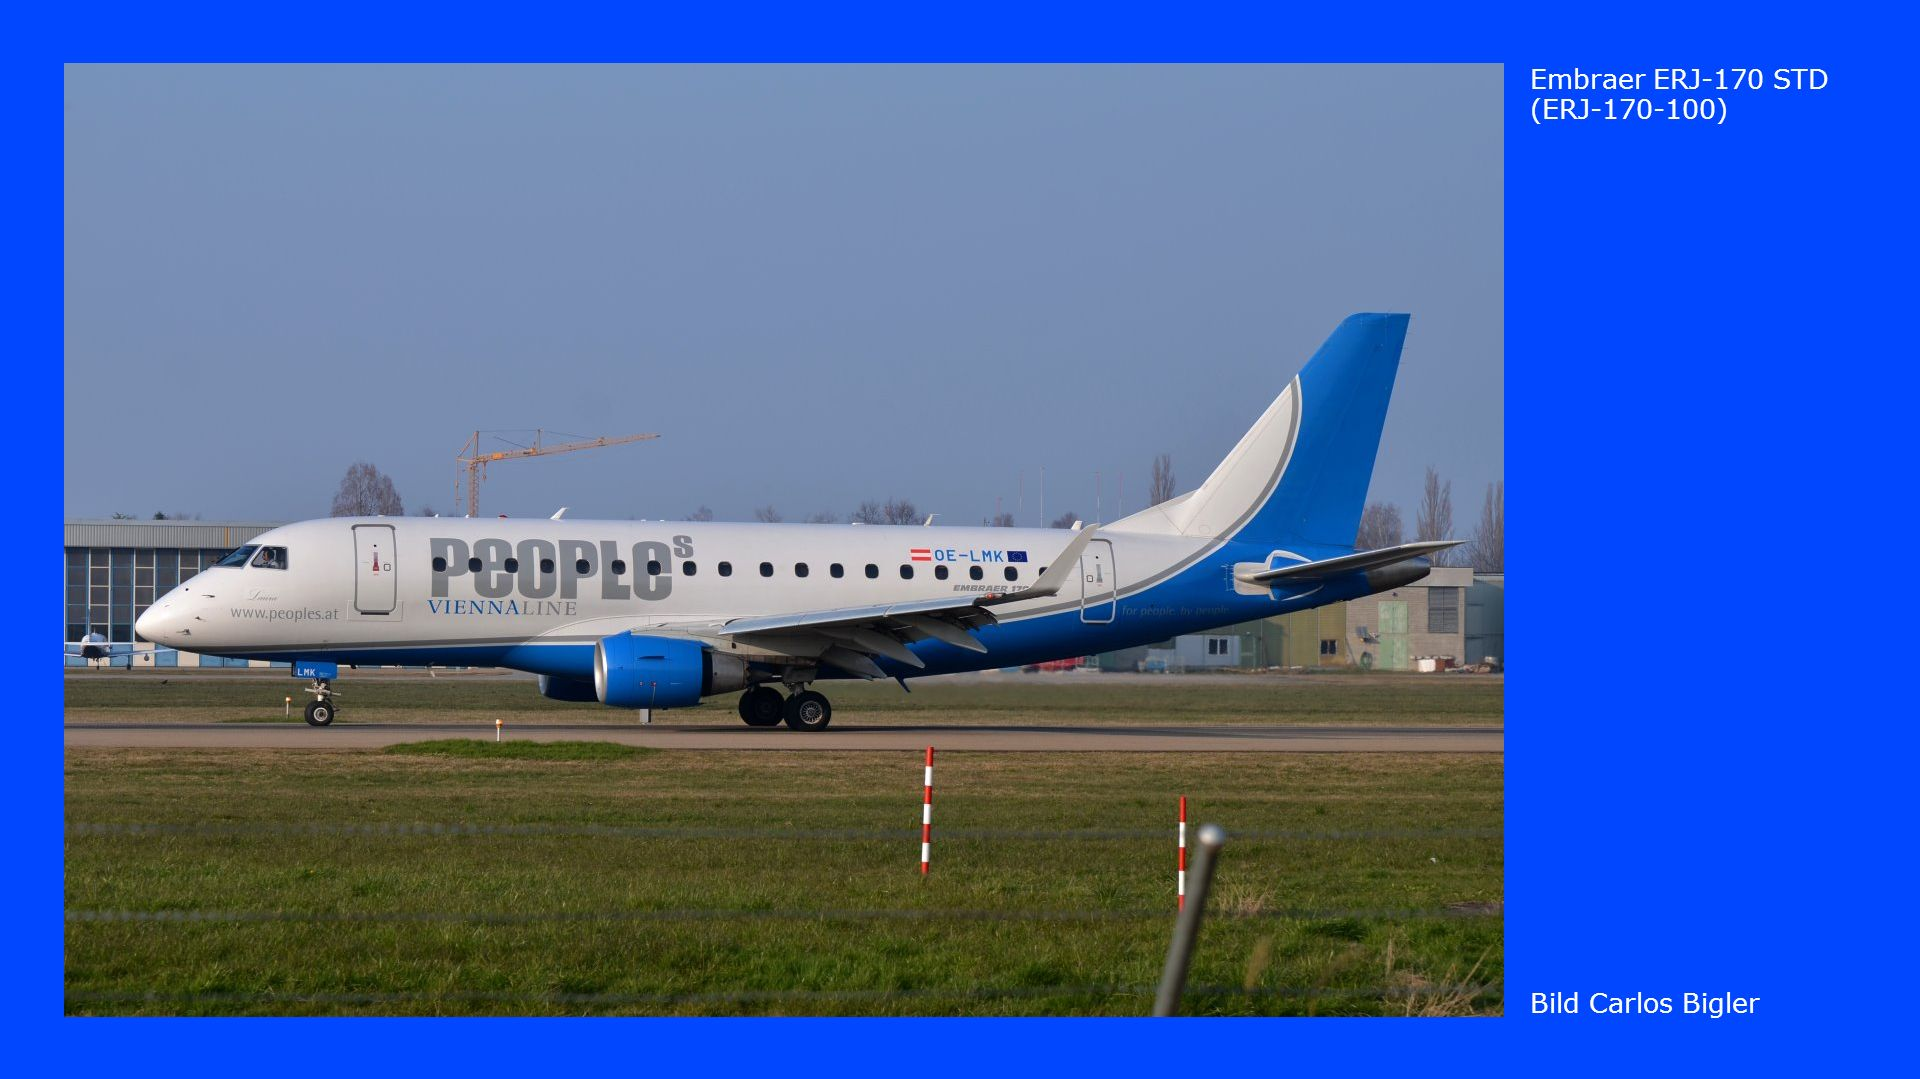 Bild Carlos Bigler Embraer ERJ-170 STD (ERJ-170-100)